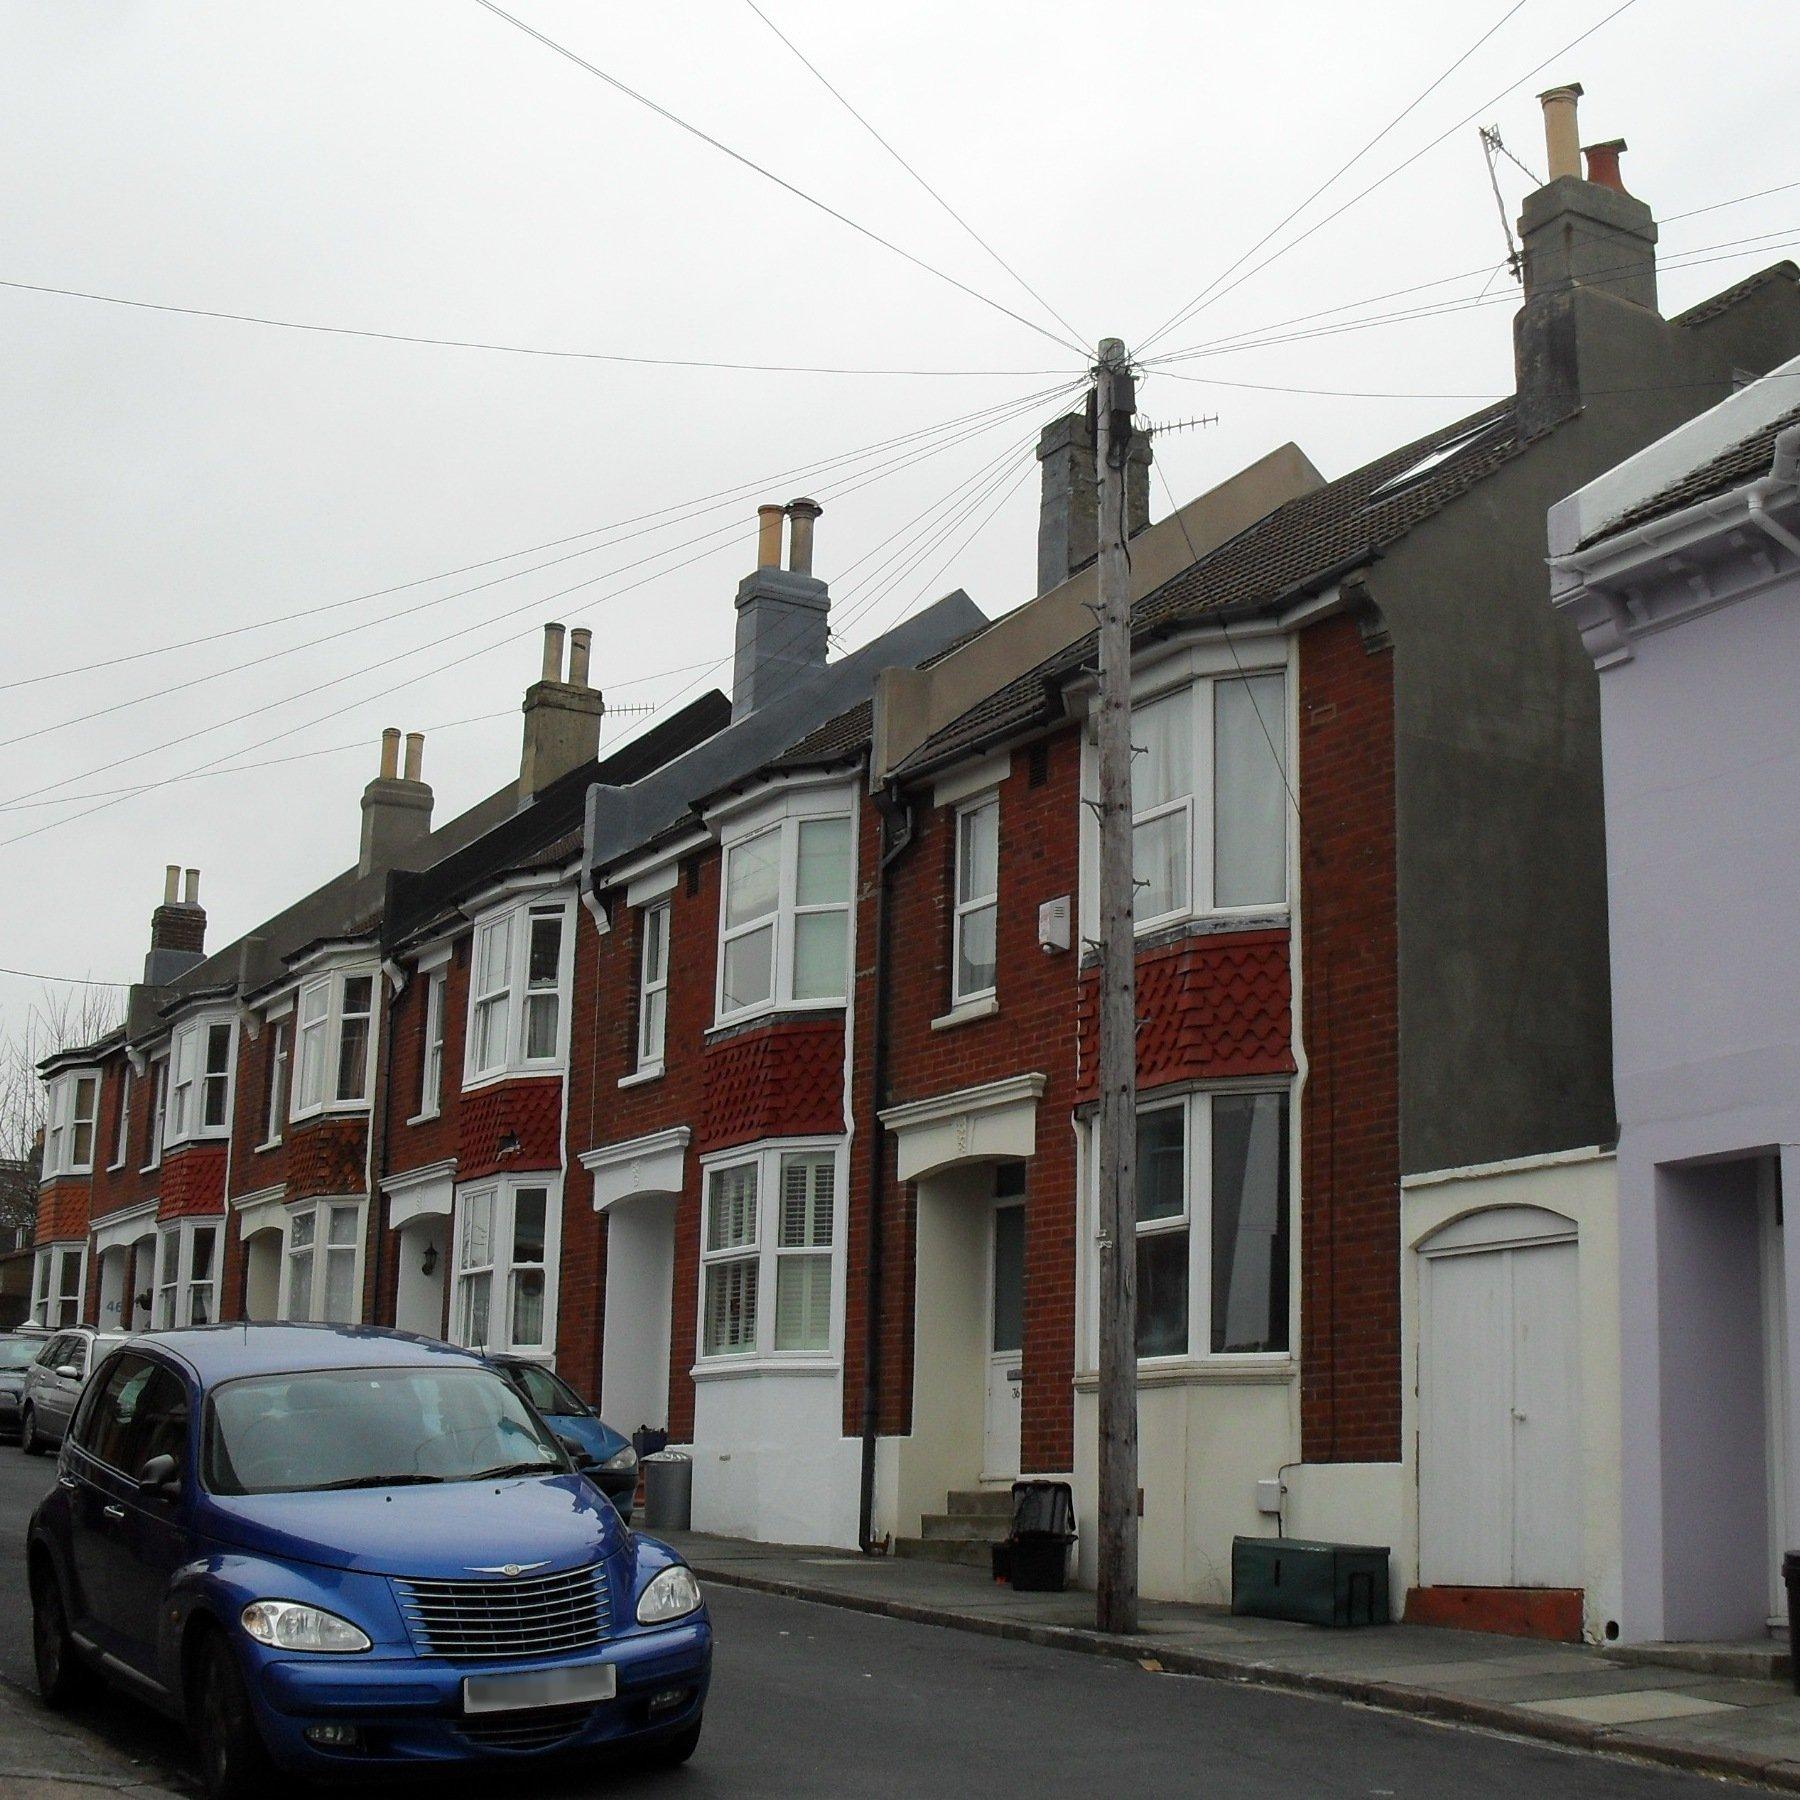 File:Brick Houses at Belton Road, Round Hill, Brighton JPG